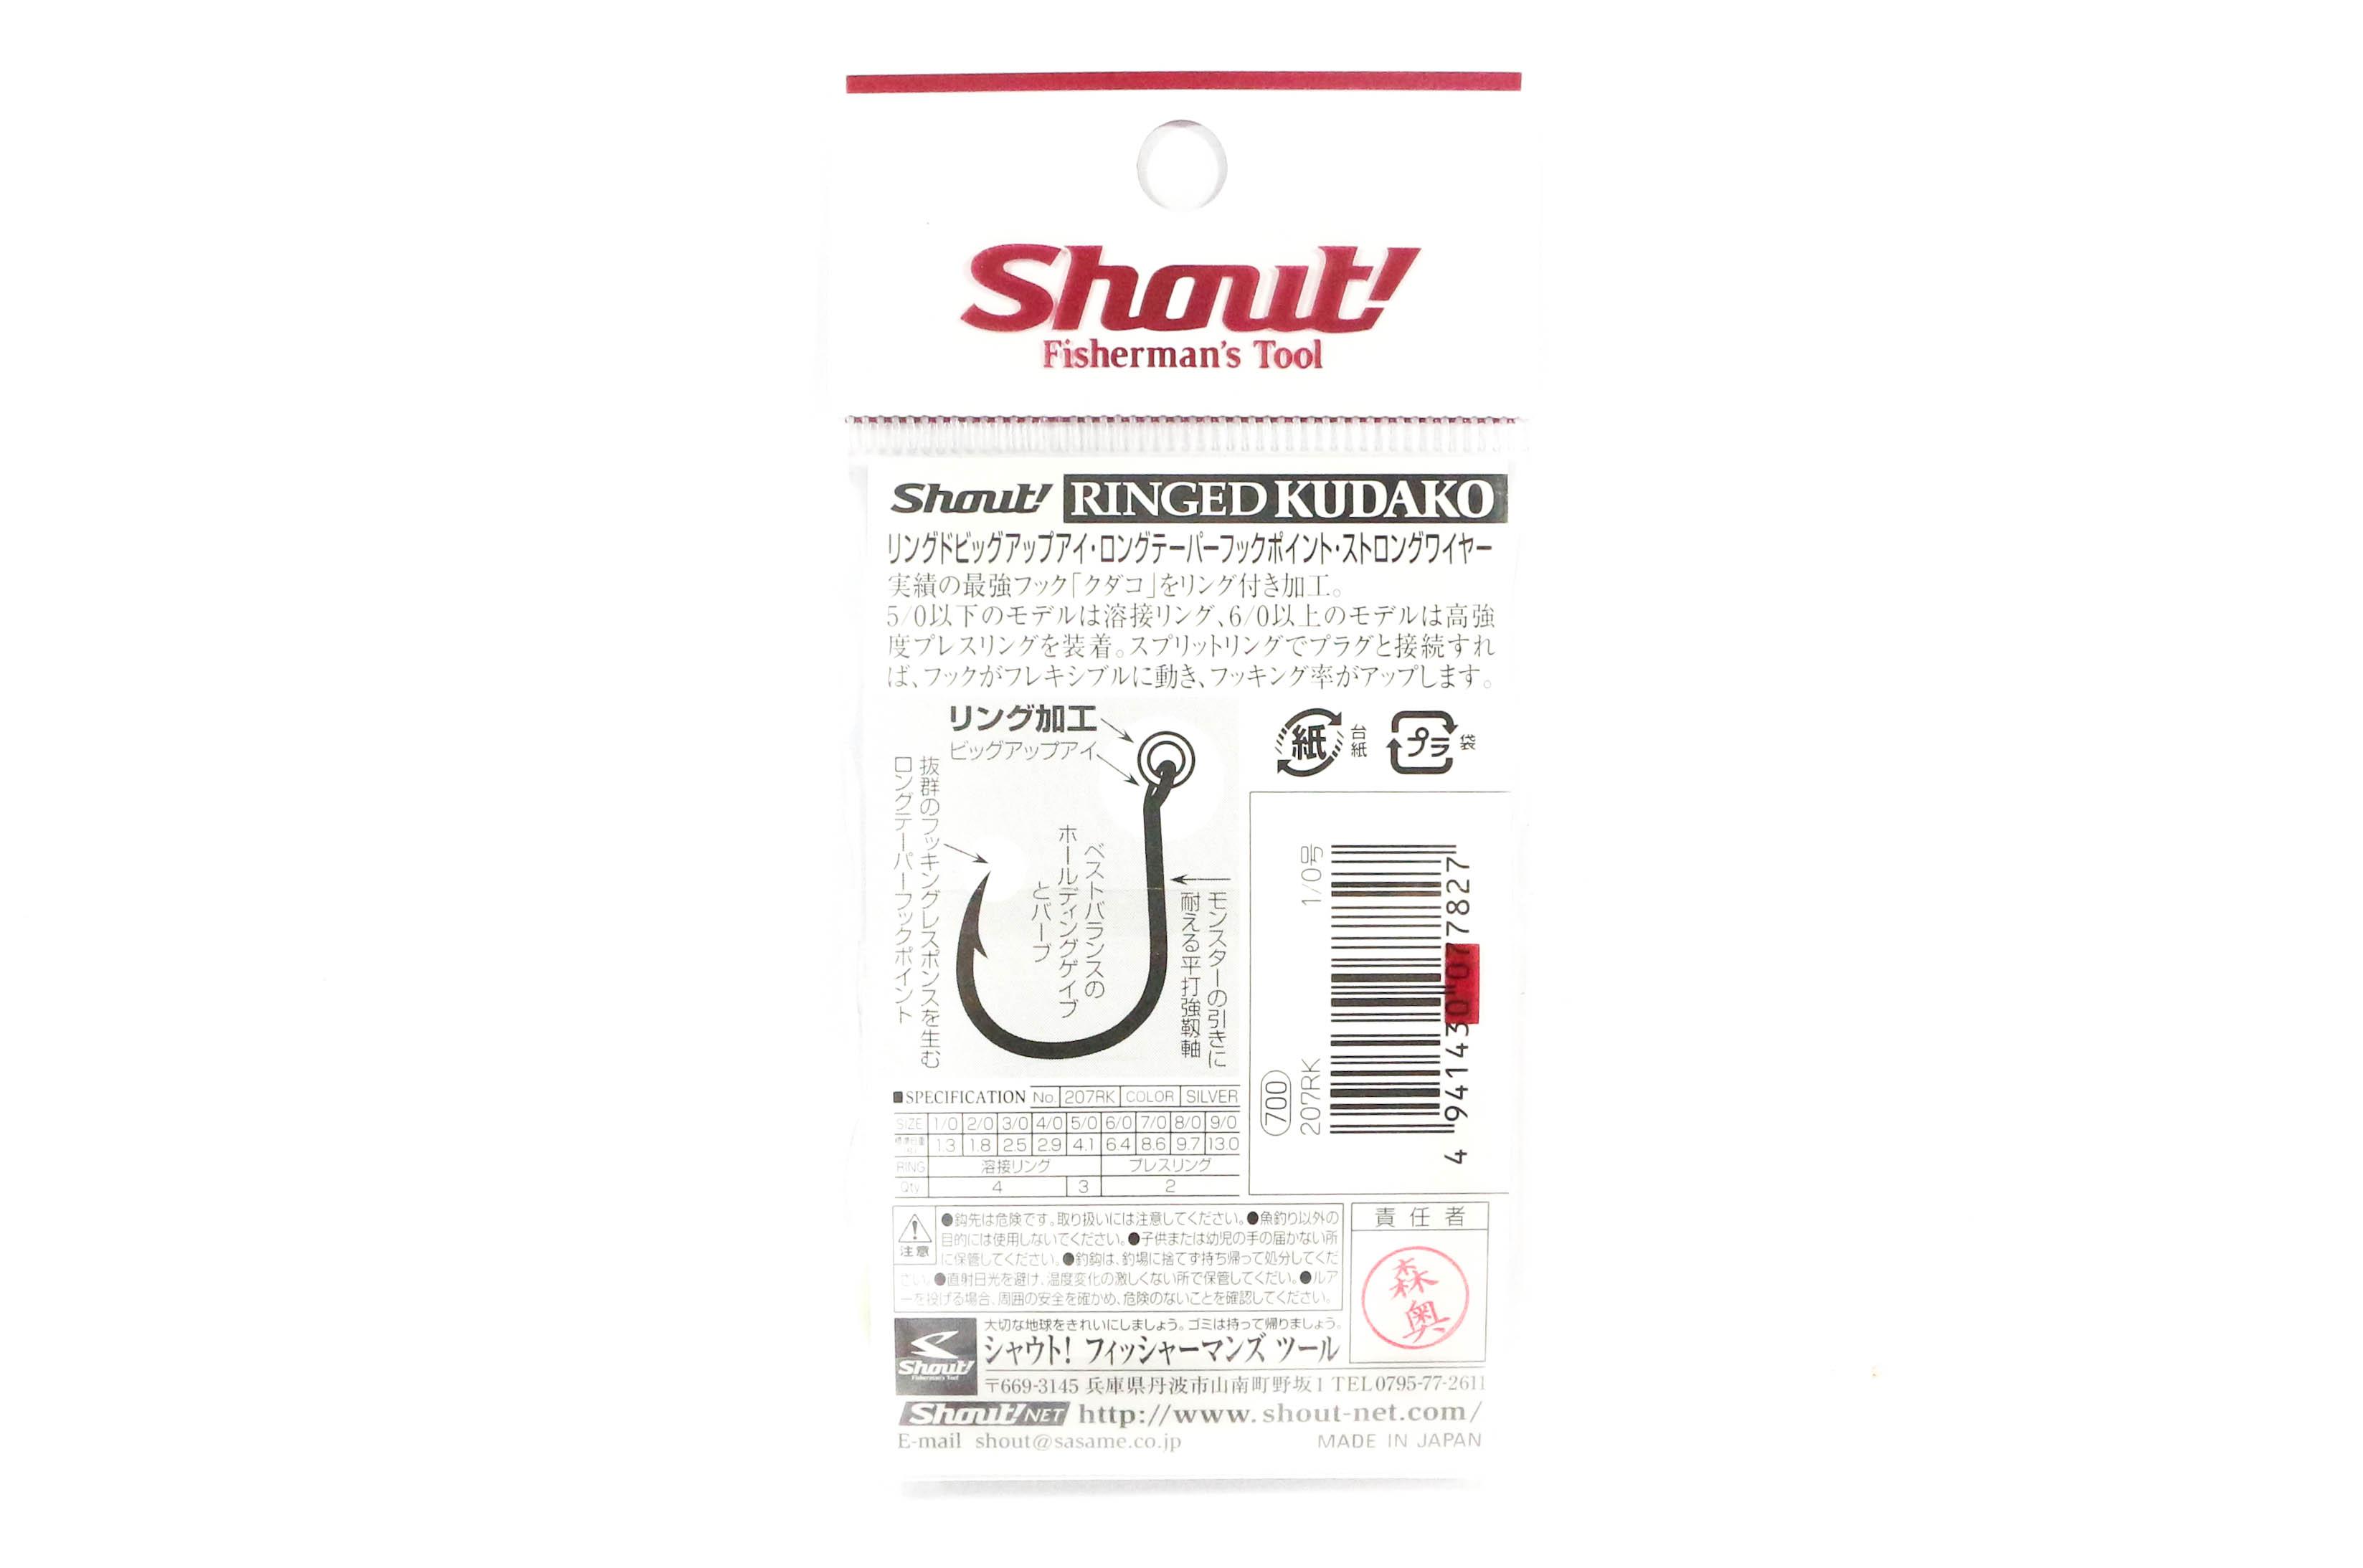 7902 207-RK Ringed Kudako Power Jigging Single Hook Silver Size 9//0 Shout